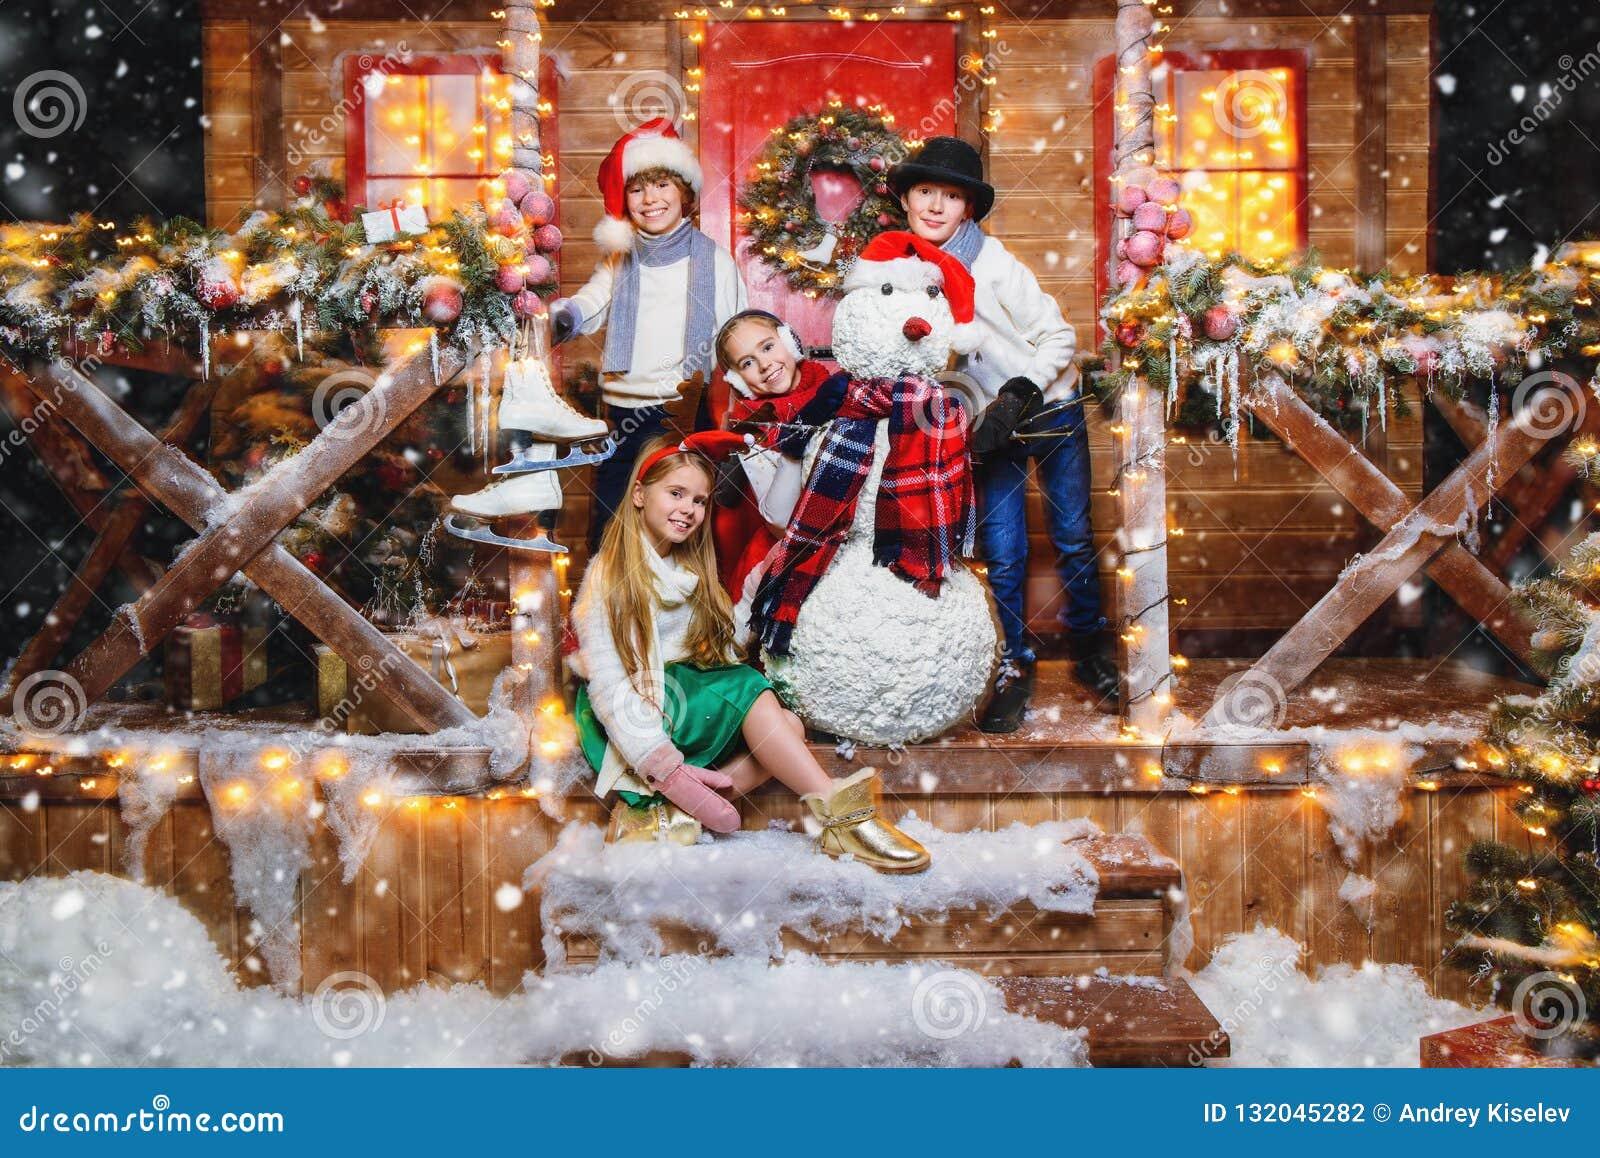 Celebrating christmas in yard